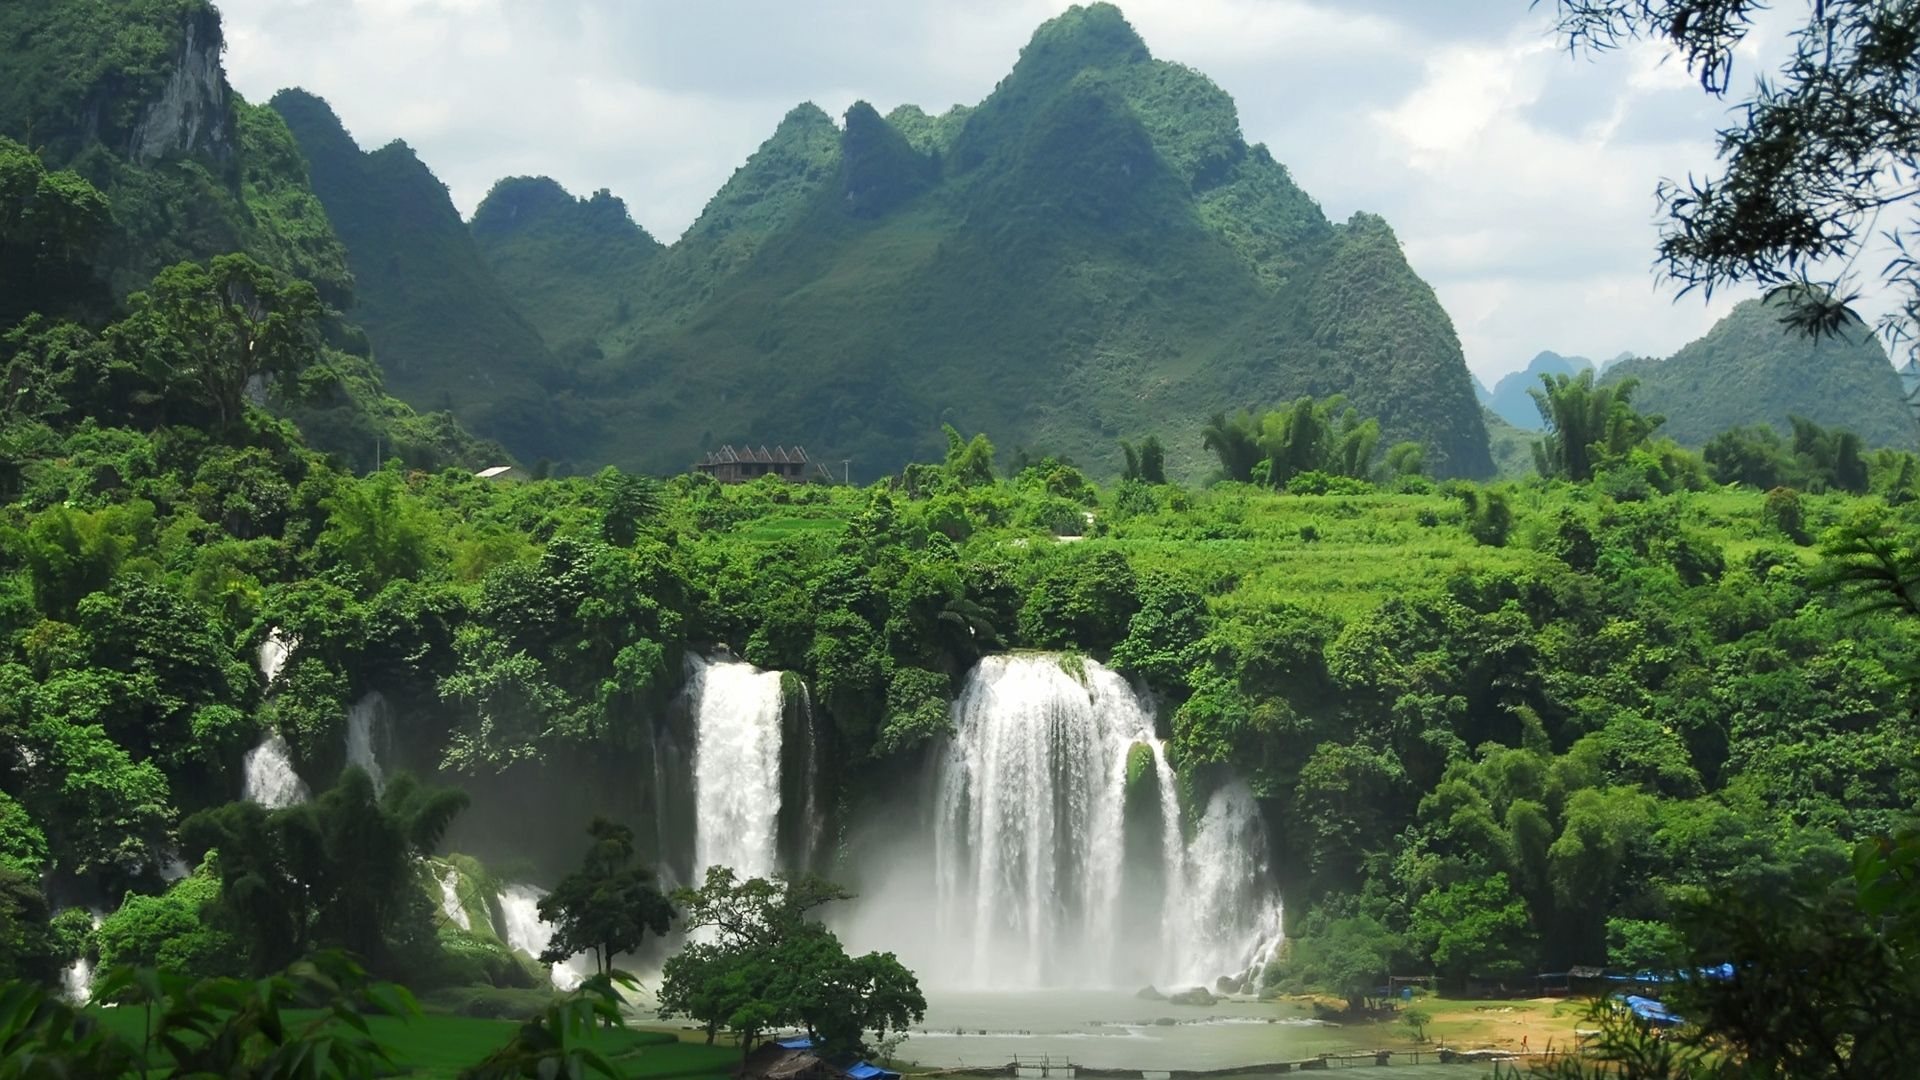 falls, bann giok, vietnam - http://www.wallpapers4u.org/falls-bann-giok-vietnam/